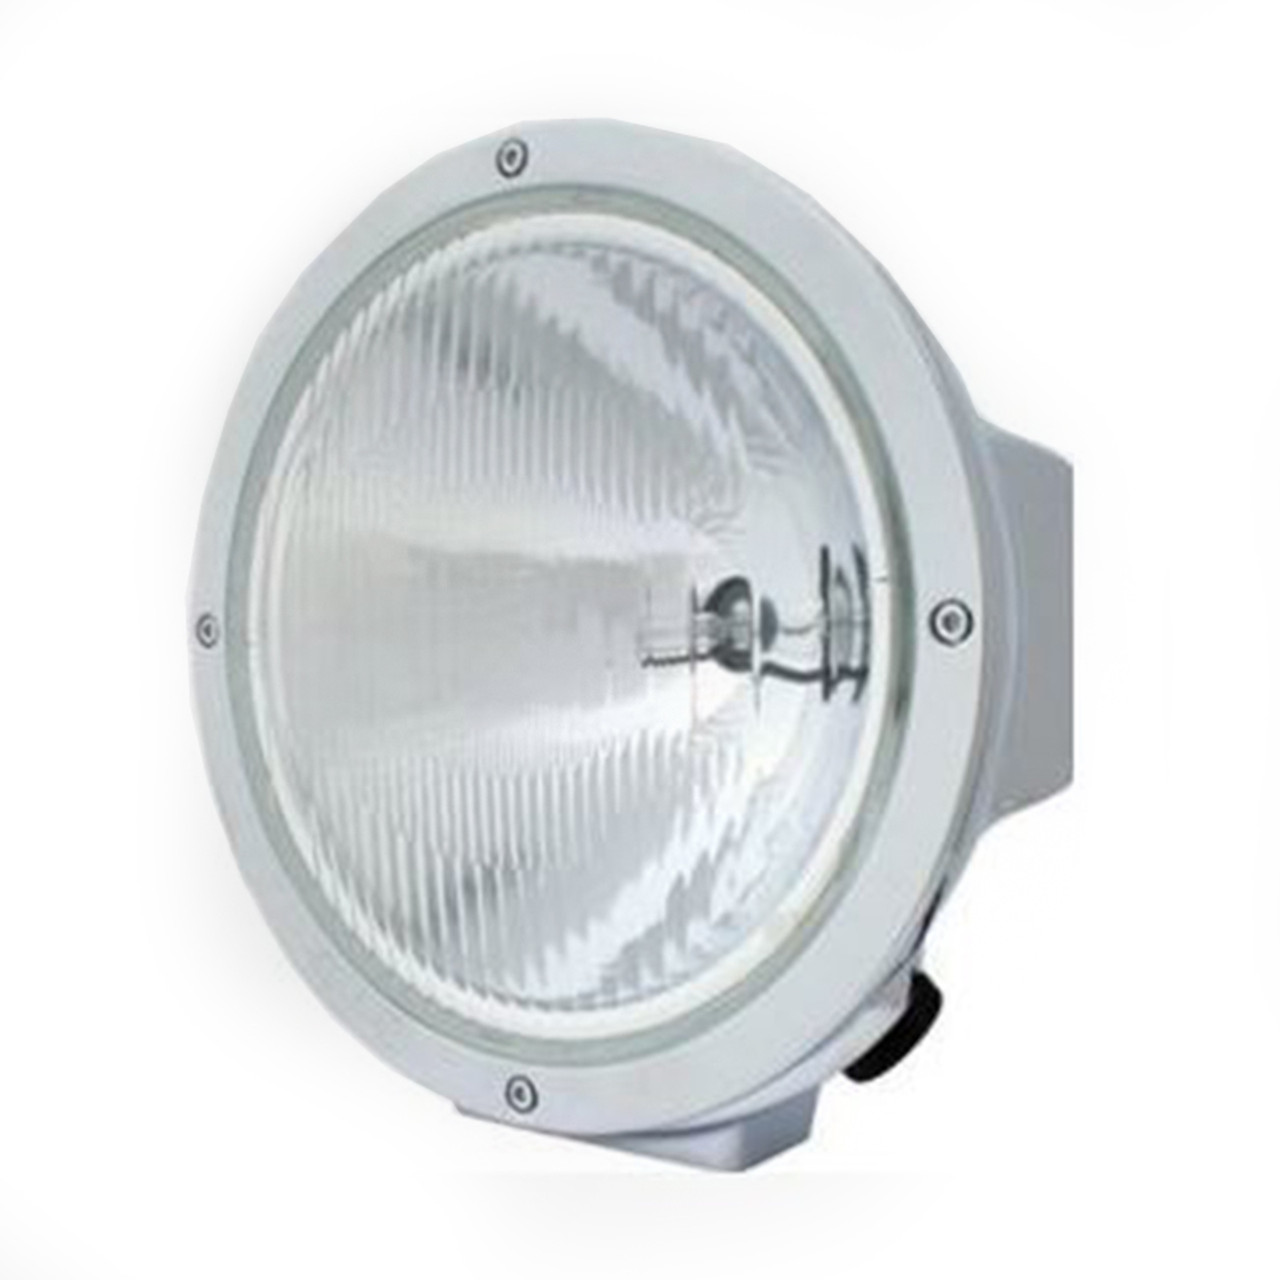 Vision X Lighting VX-6504C 181 Watt Halogen Hi or Lo Beam Lamp